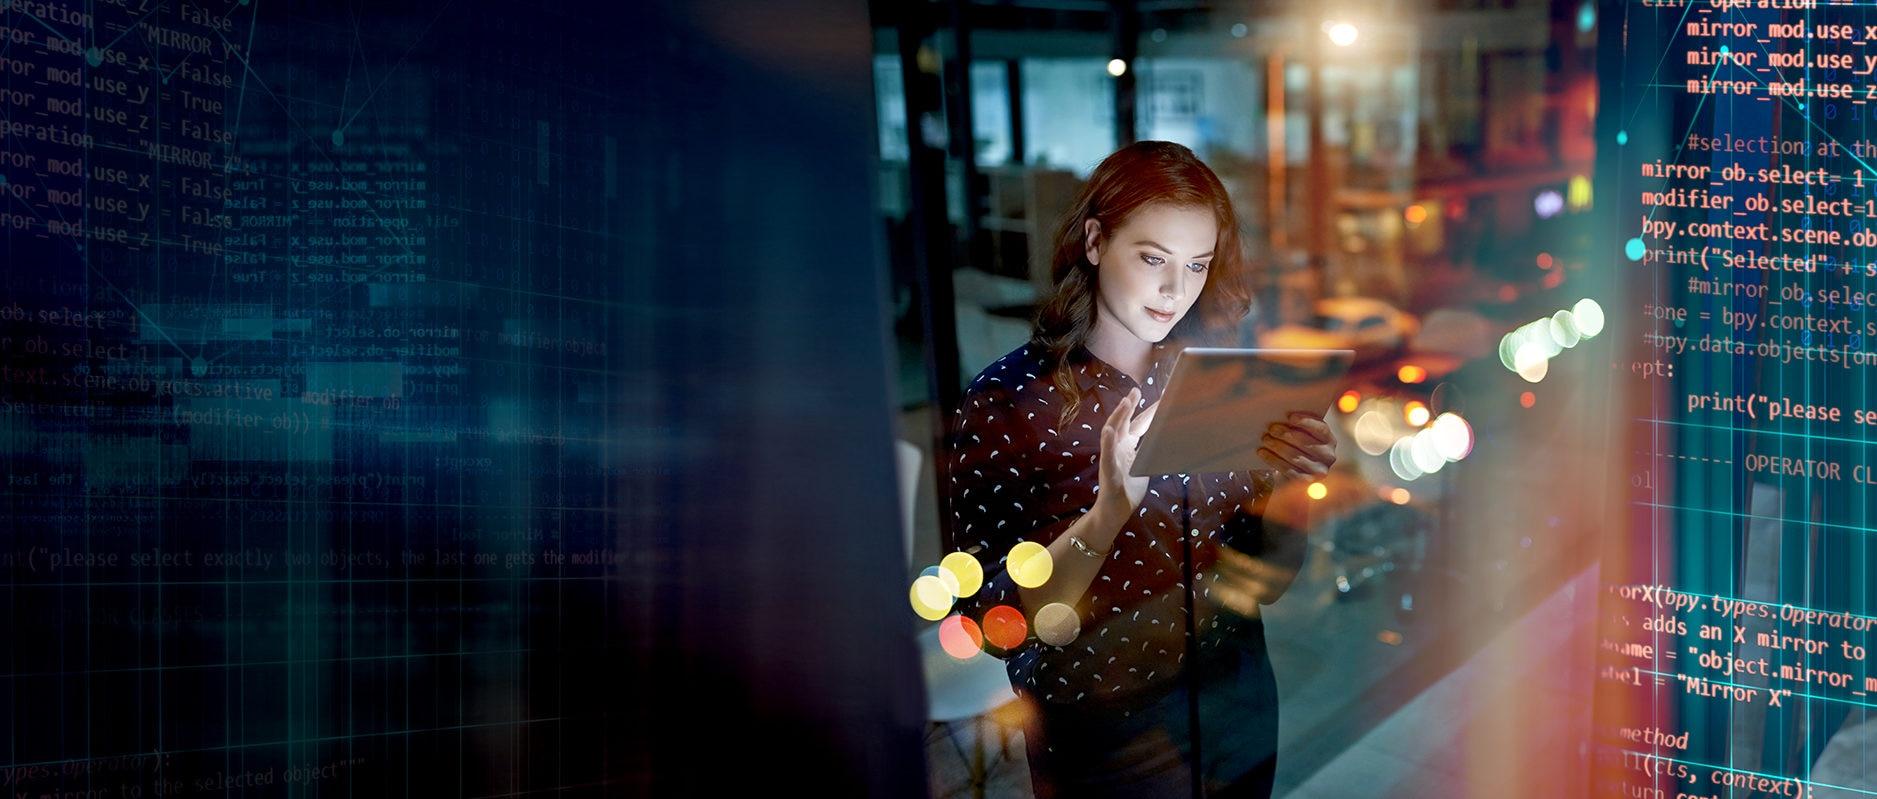 pagos-tablet-tecnologia-innovacion-digital-transformacion-mujer-bbva